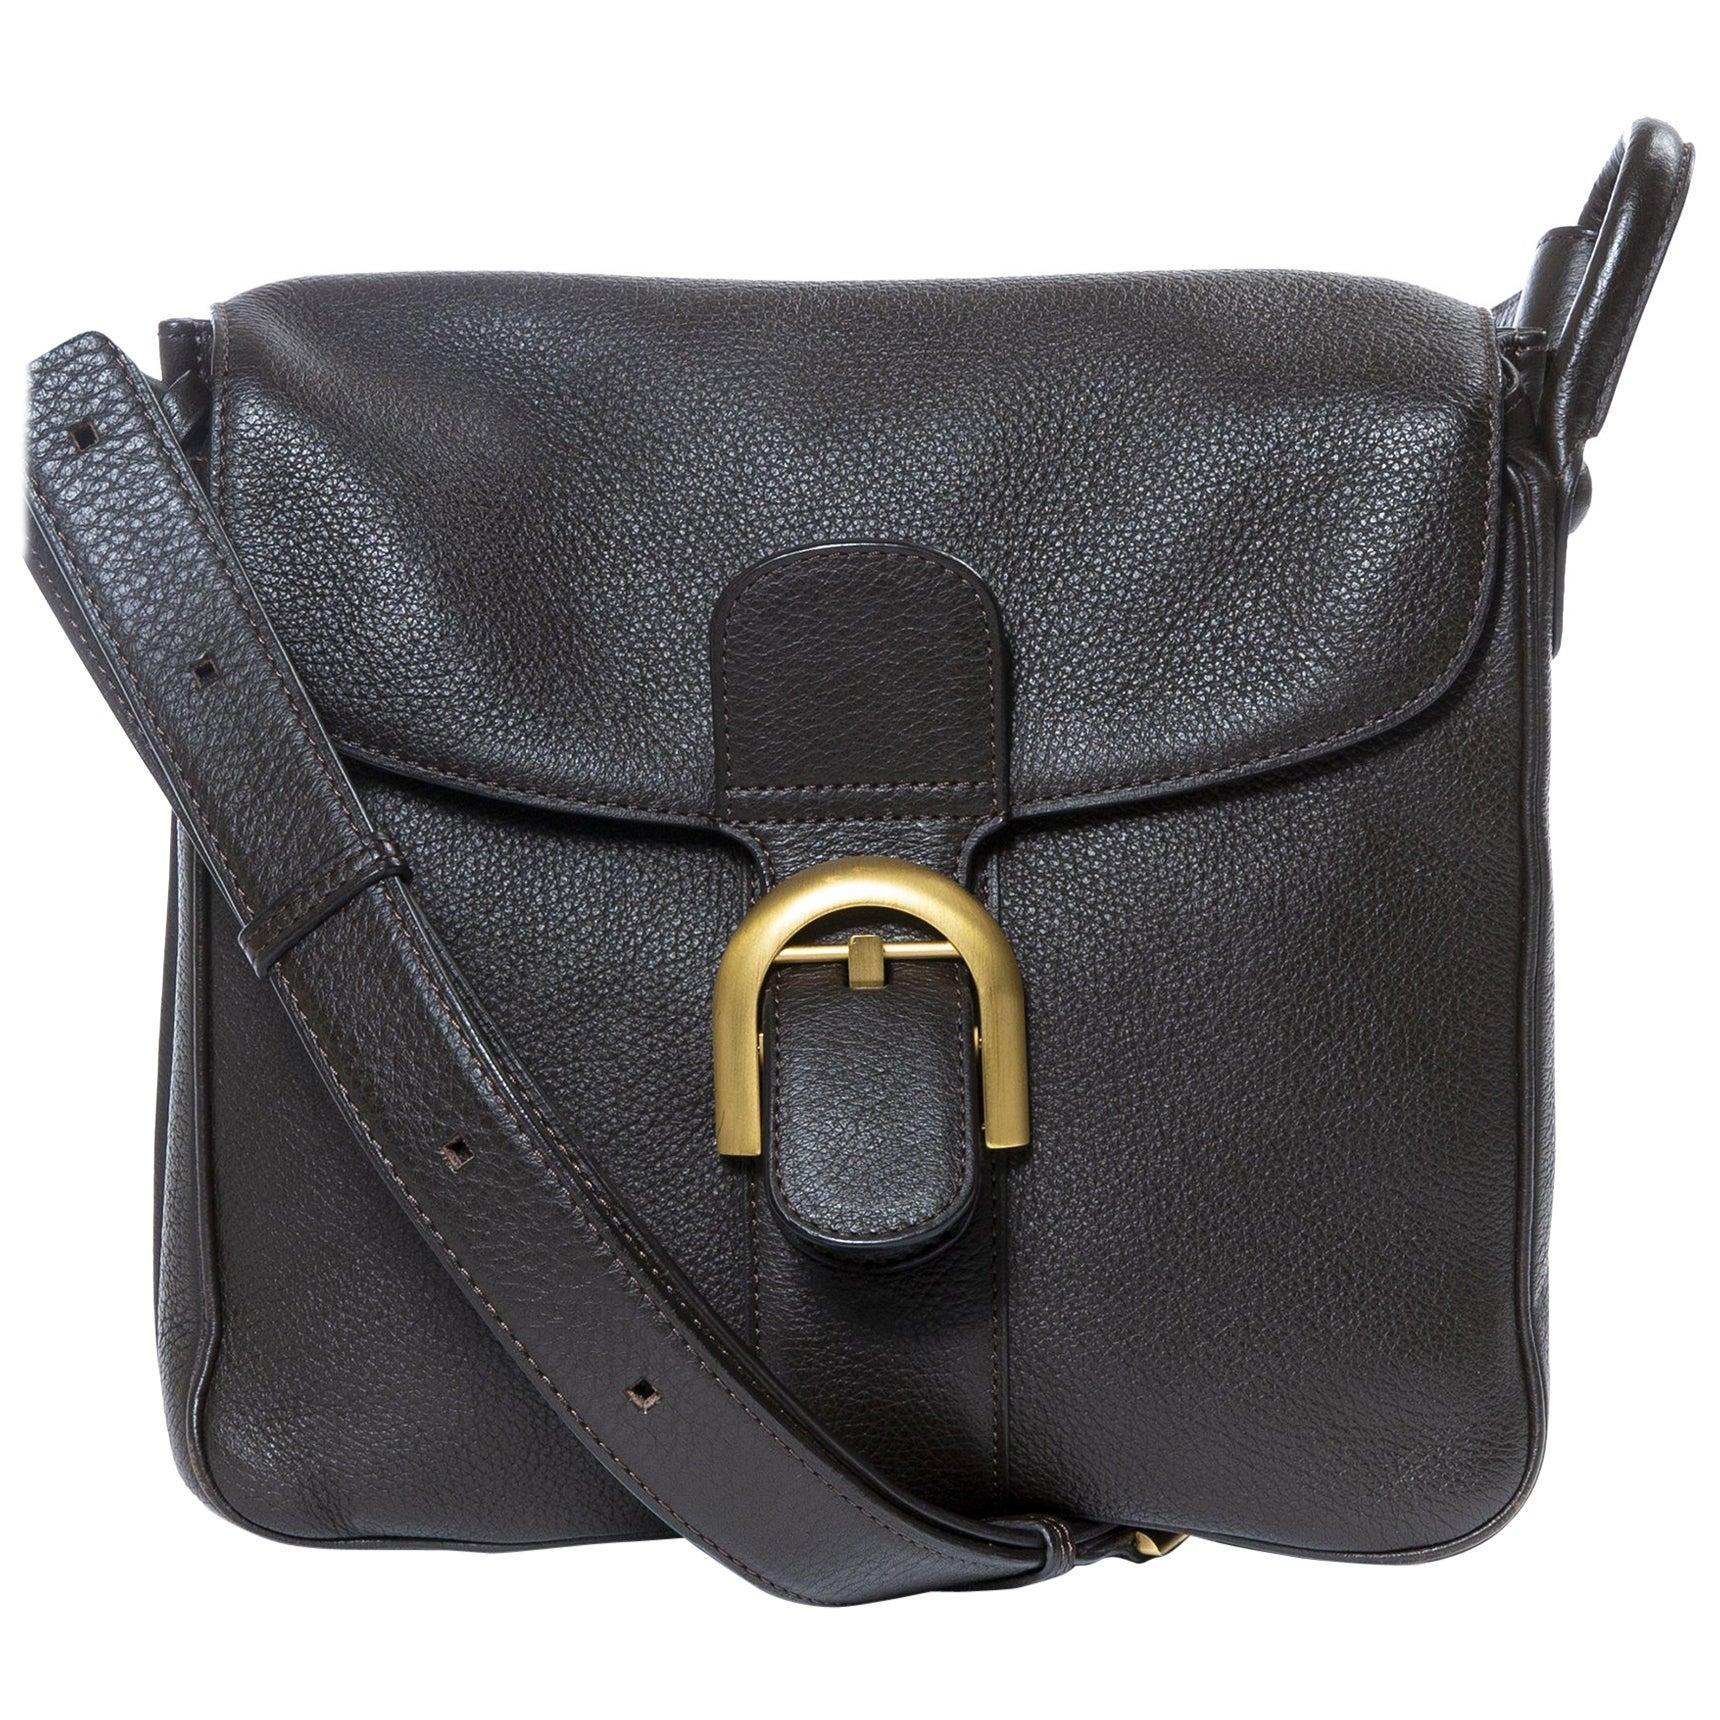 Delvaux Brillant Baudrier Brown Leather Bag